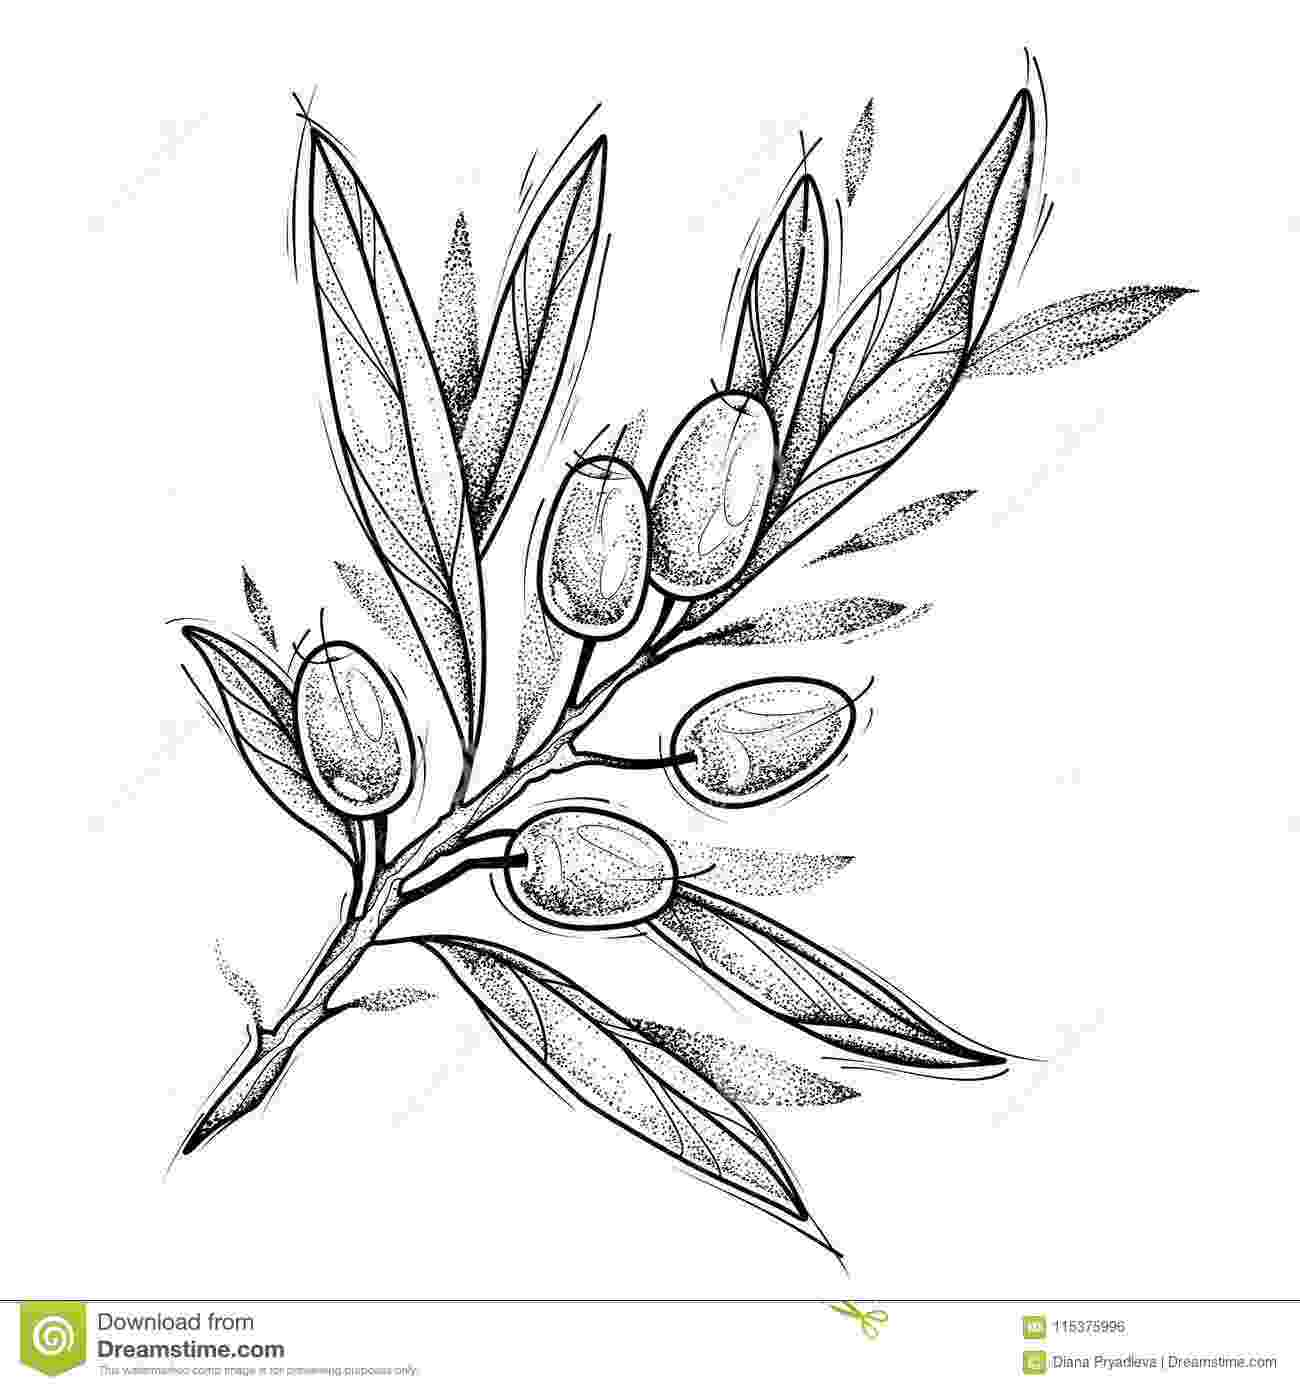 olive branch sketch olive branch tattoo design vector illustration isolated sketch olive branch